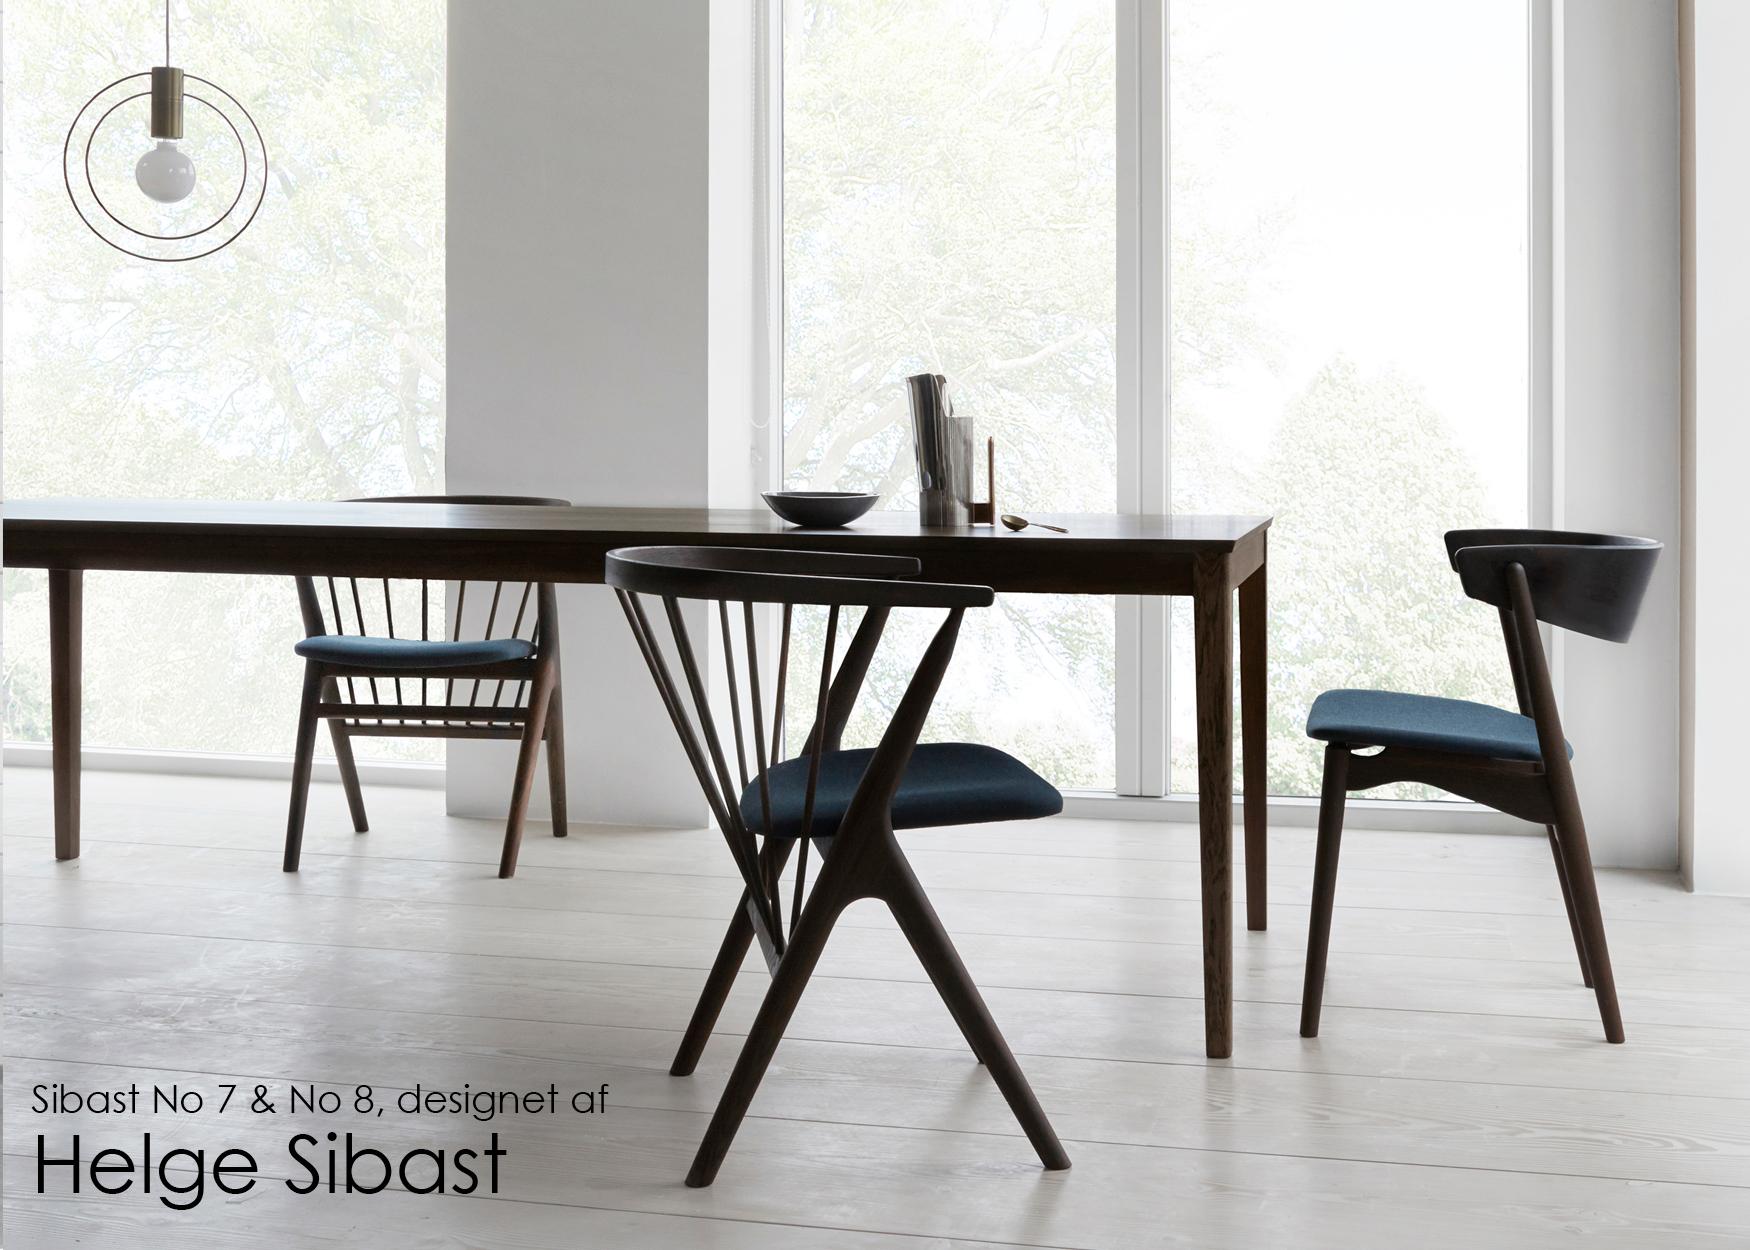 Shop stole fra Sibast